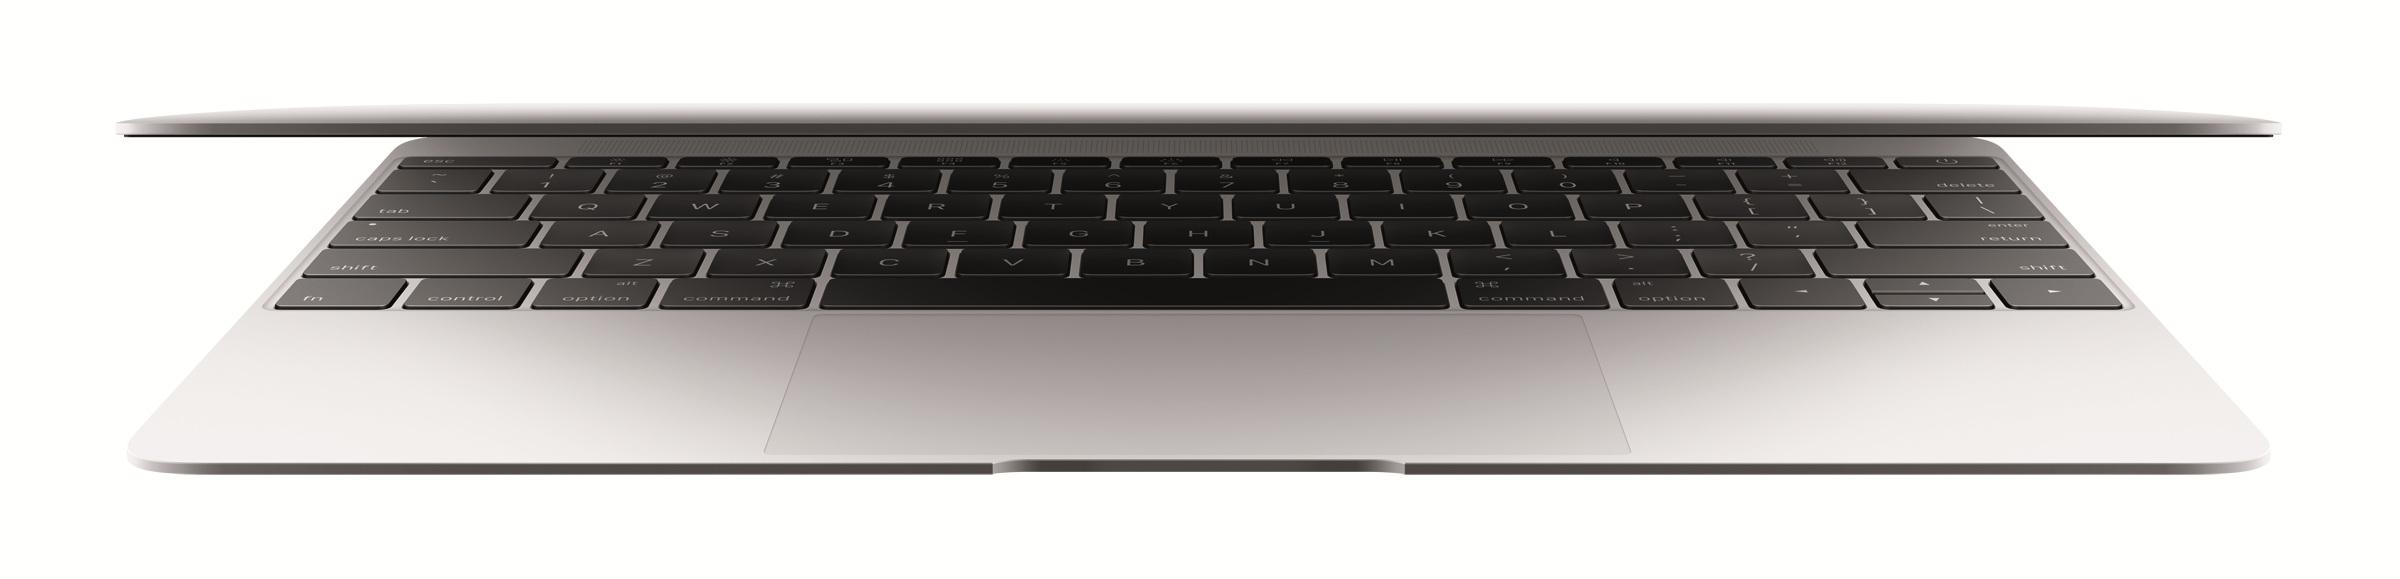 Apple Stops Selling 12-Inch MacBook Laptops